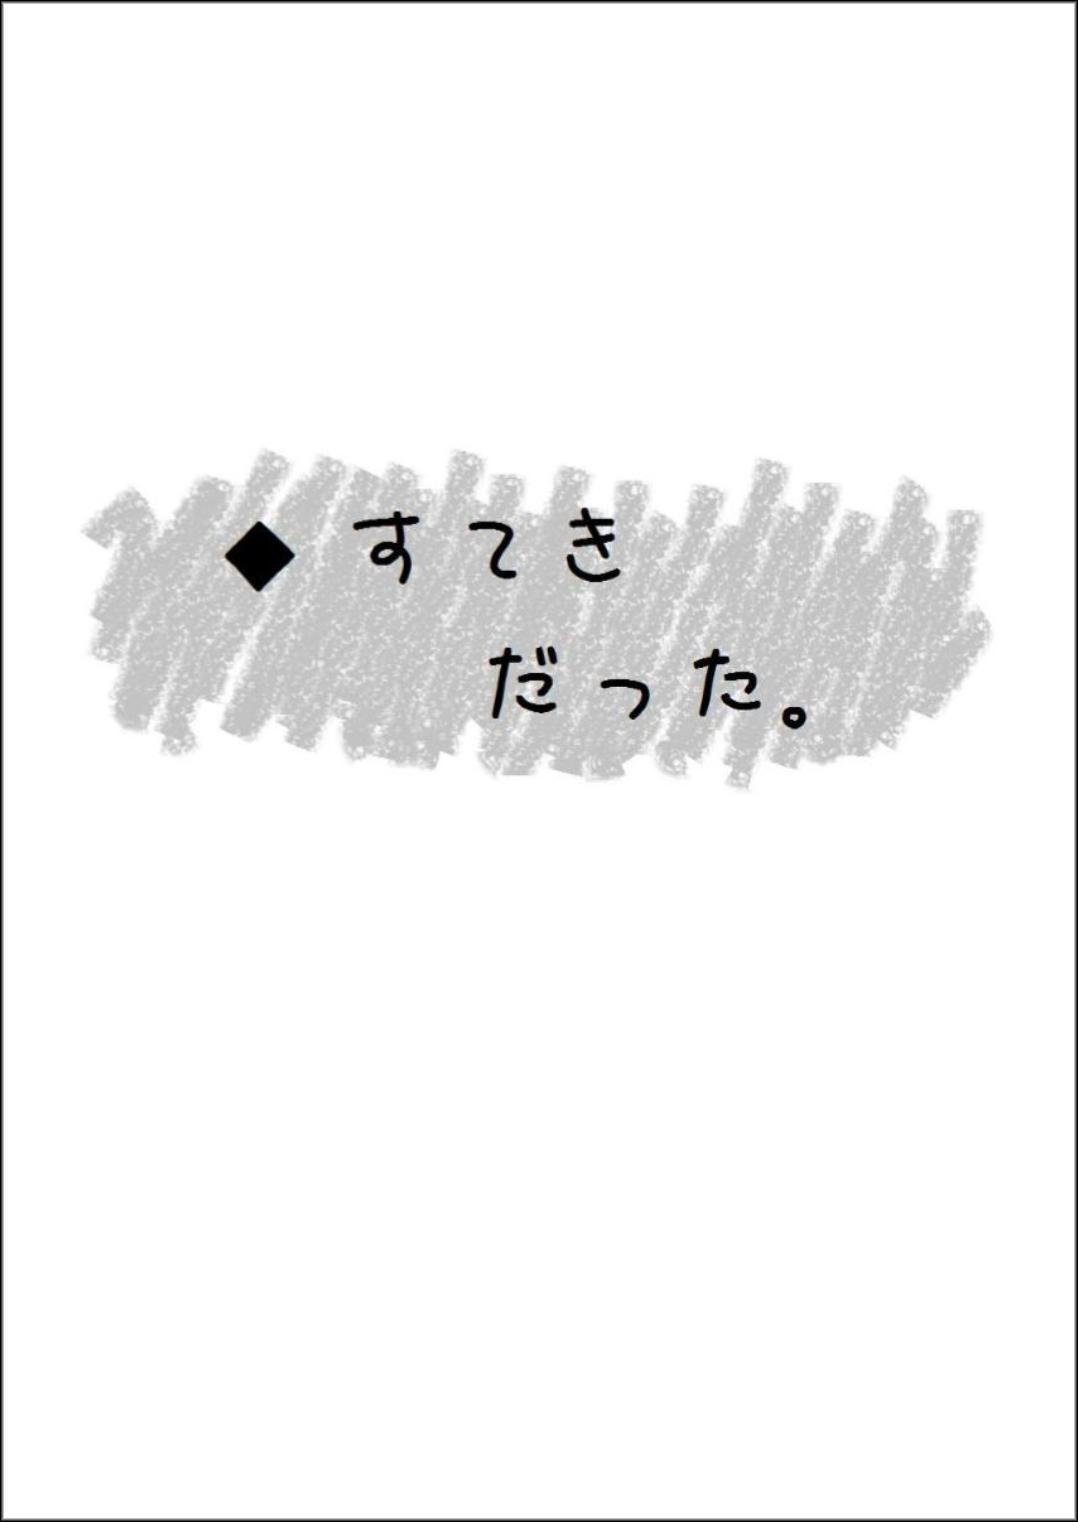 C32431614